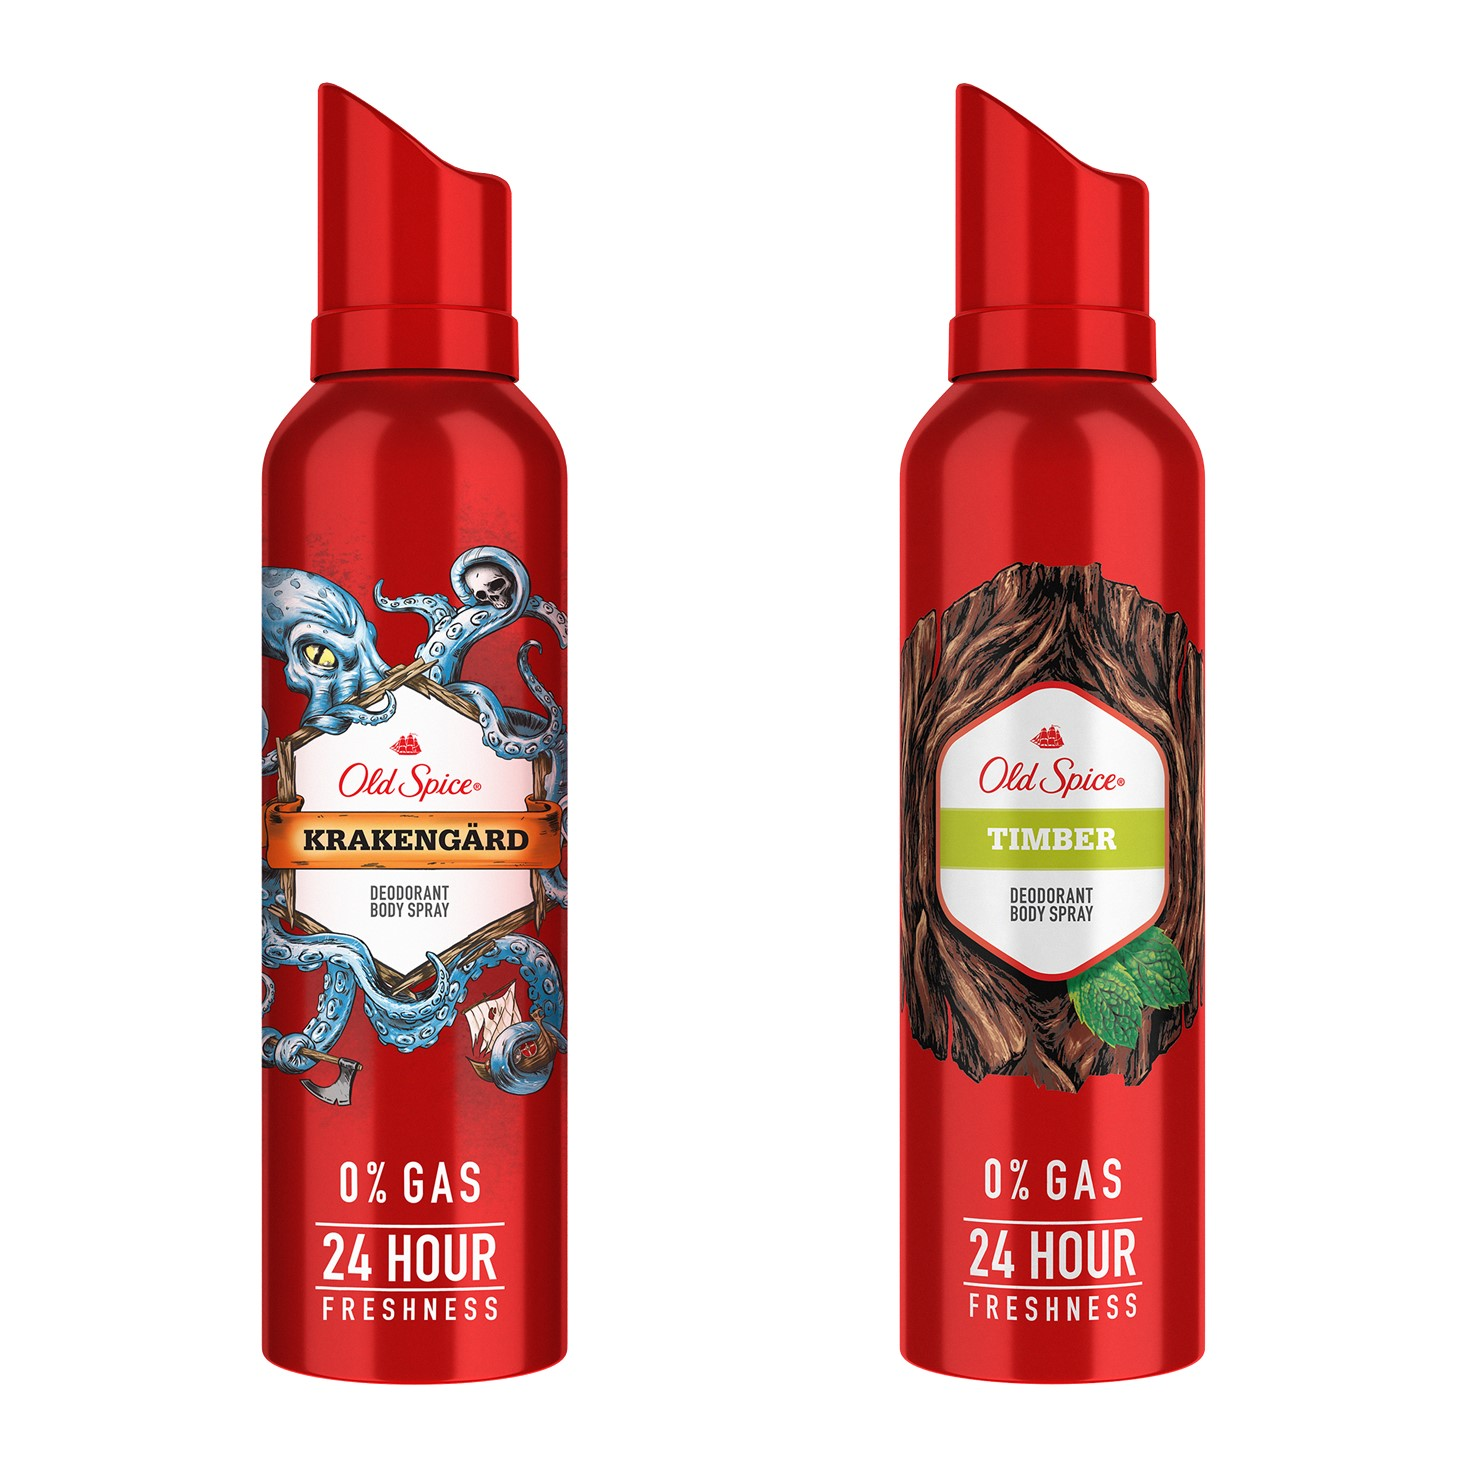 Old Spice Krakengard and Timber Deodorant Body Spray, 140 ml each